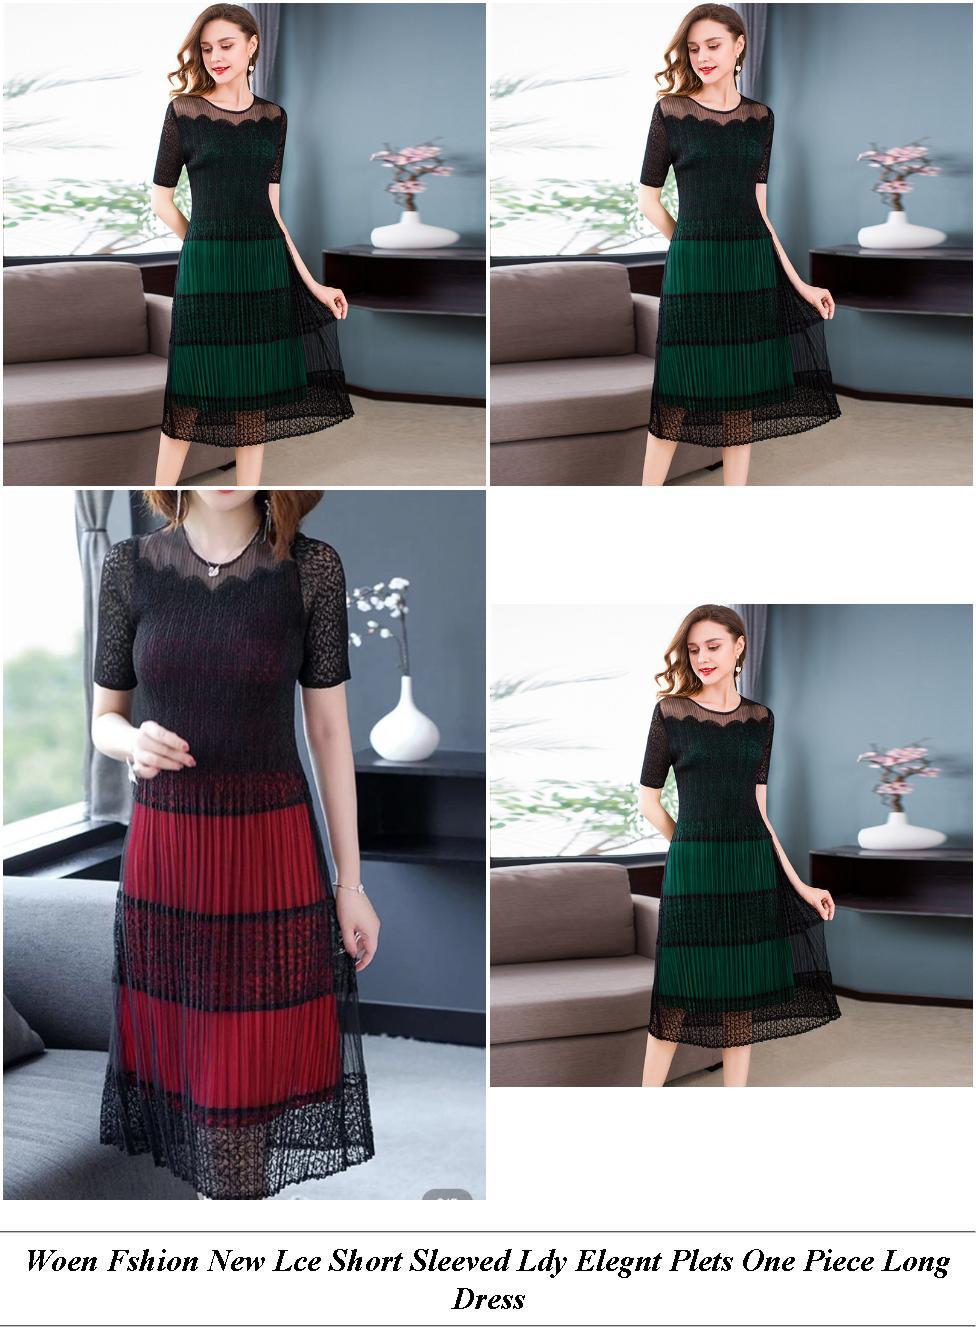 Party Dresses For Women - Us Sale - Lace Wedding Dress - Cheap Fashion Clothes